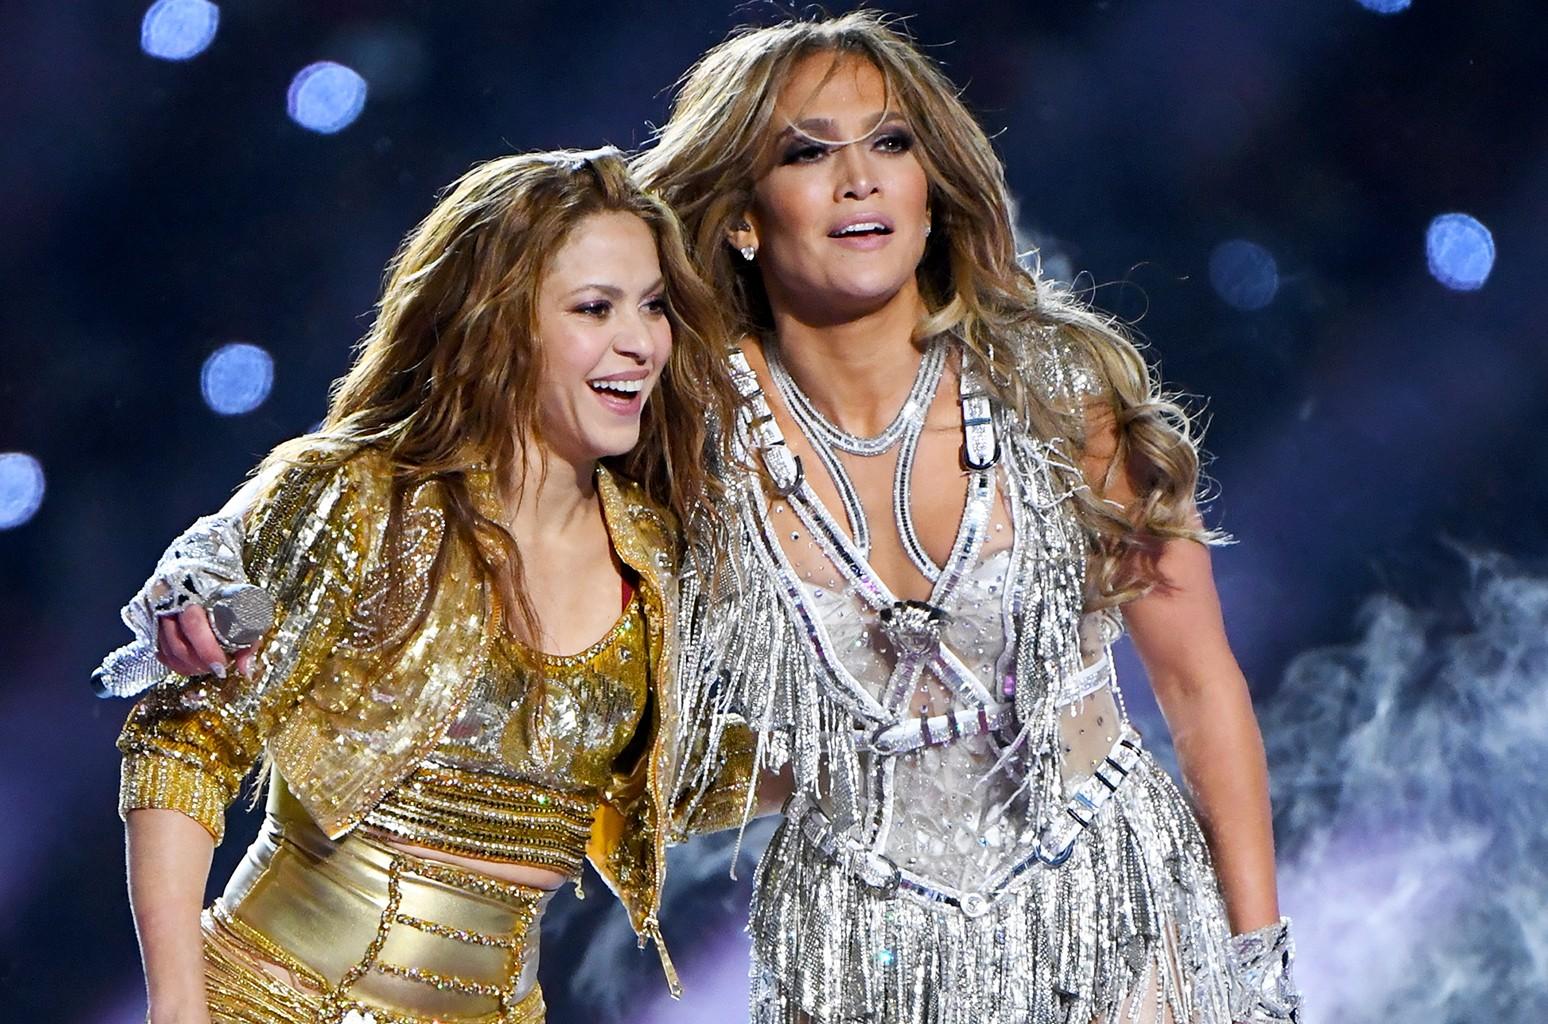 Jennifer Lopez Shakira Super Bowl Halftime Show Drew More Than 1 000 Fcc Complaints Billboard